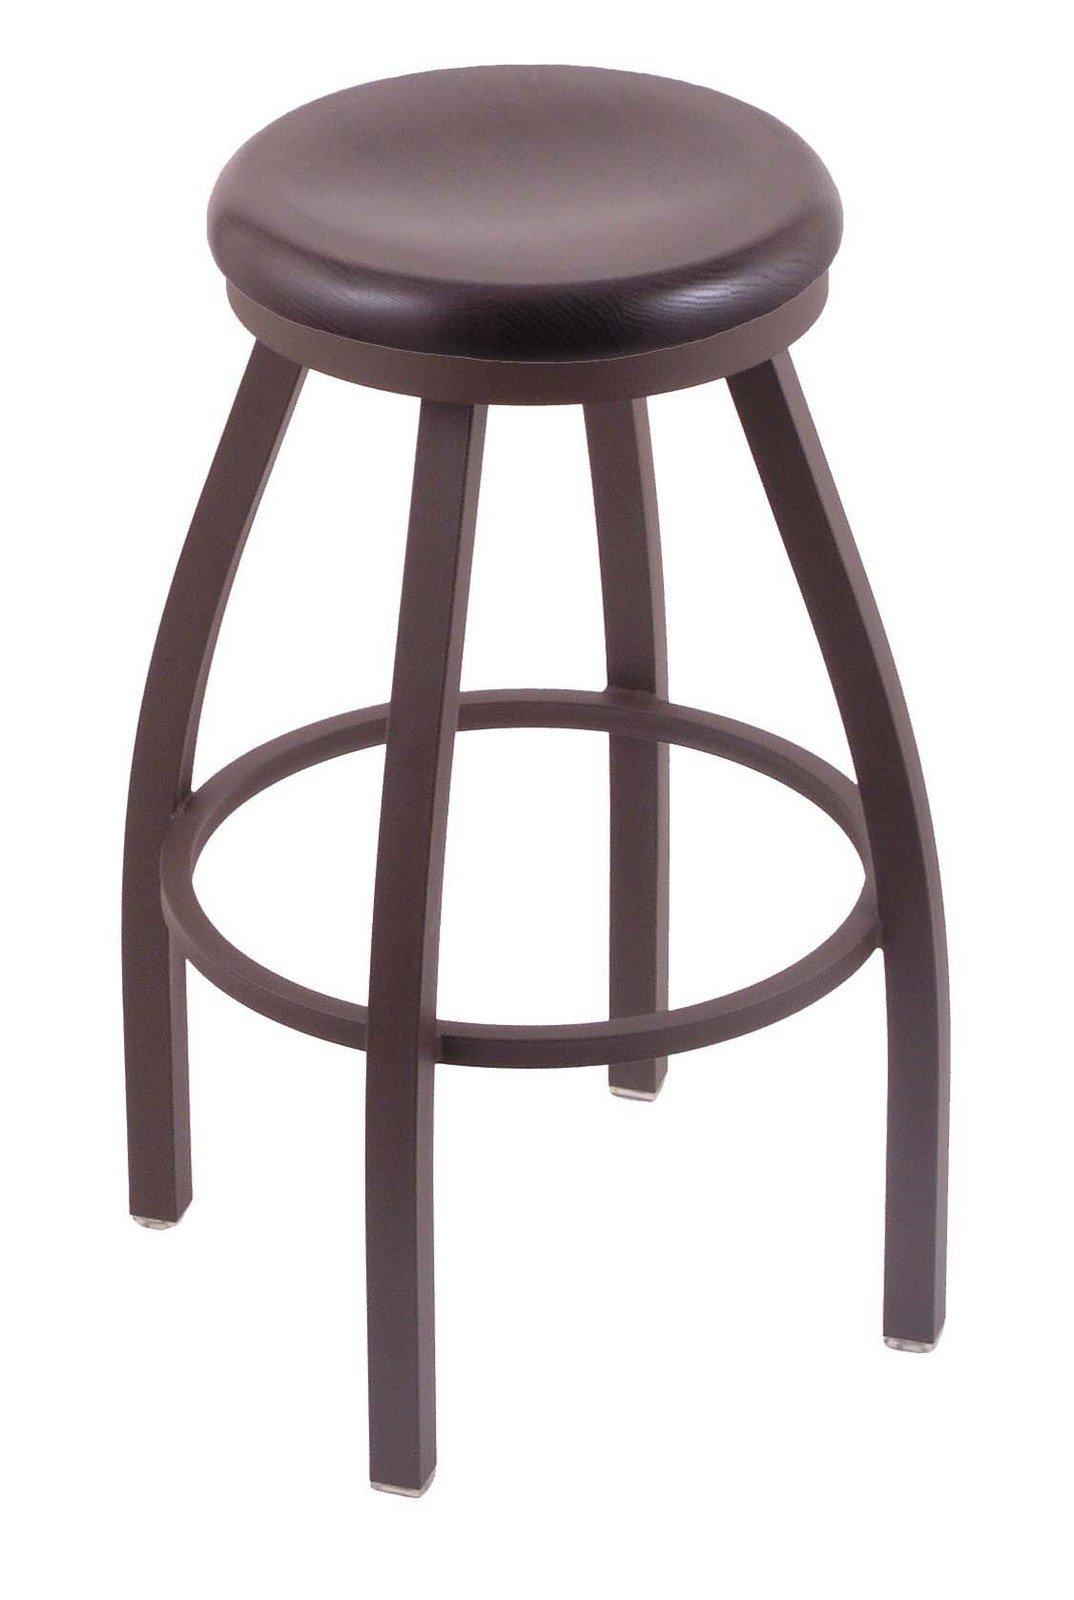 Holland Bar Stool Co. 802 Misha 30'' Bar Stool with Bronze Finish and Swivel Seat, Dark Cherry Oak by Holland Bar Stool Co.